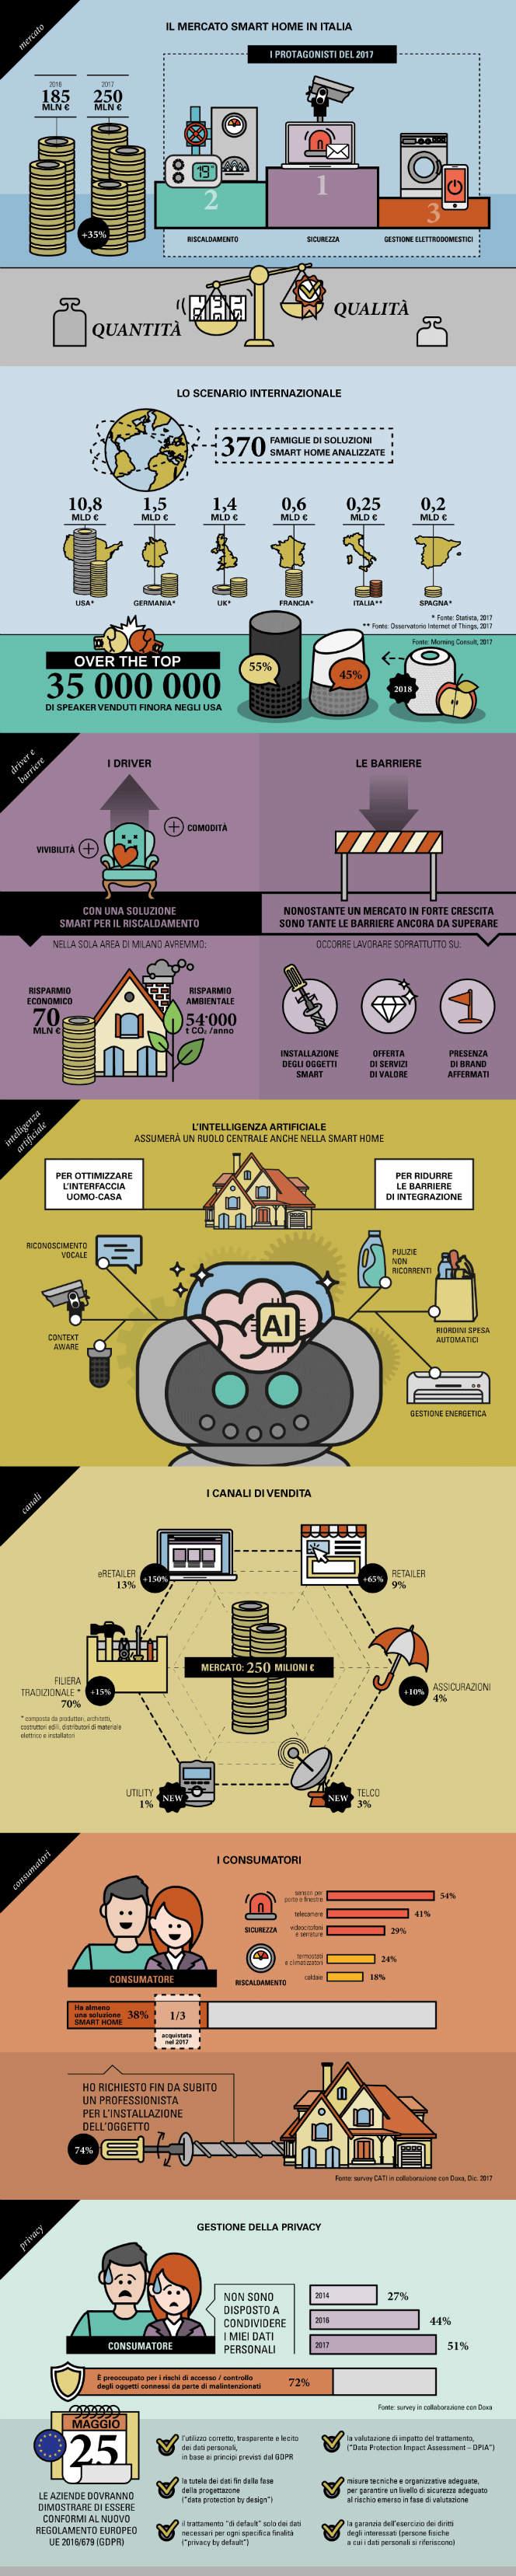 infografica iot smart home 2018